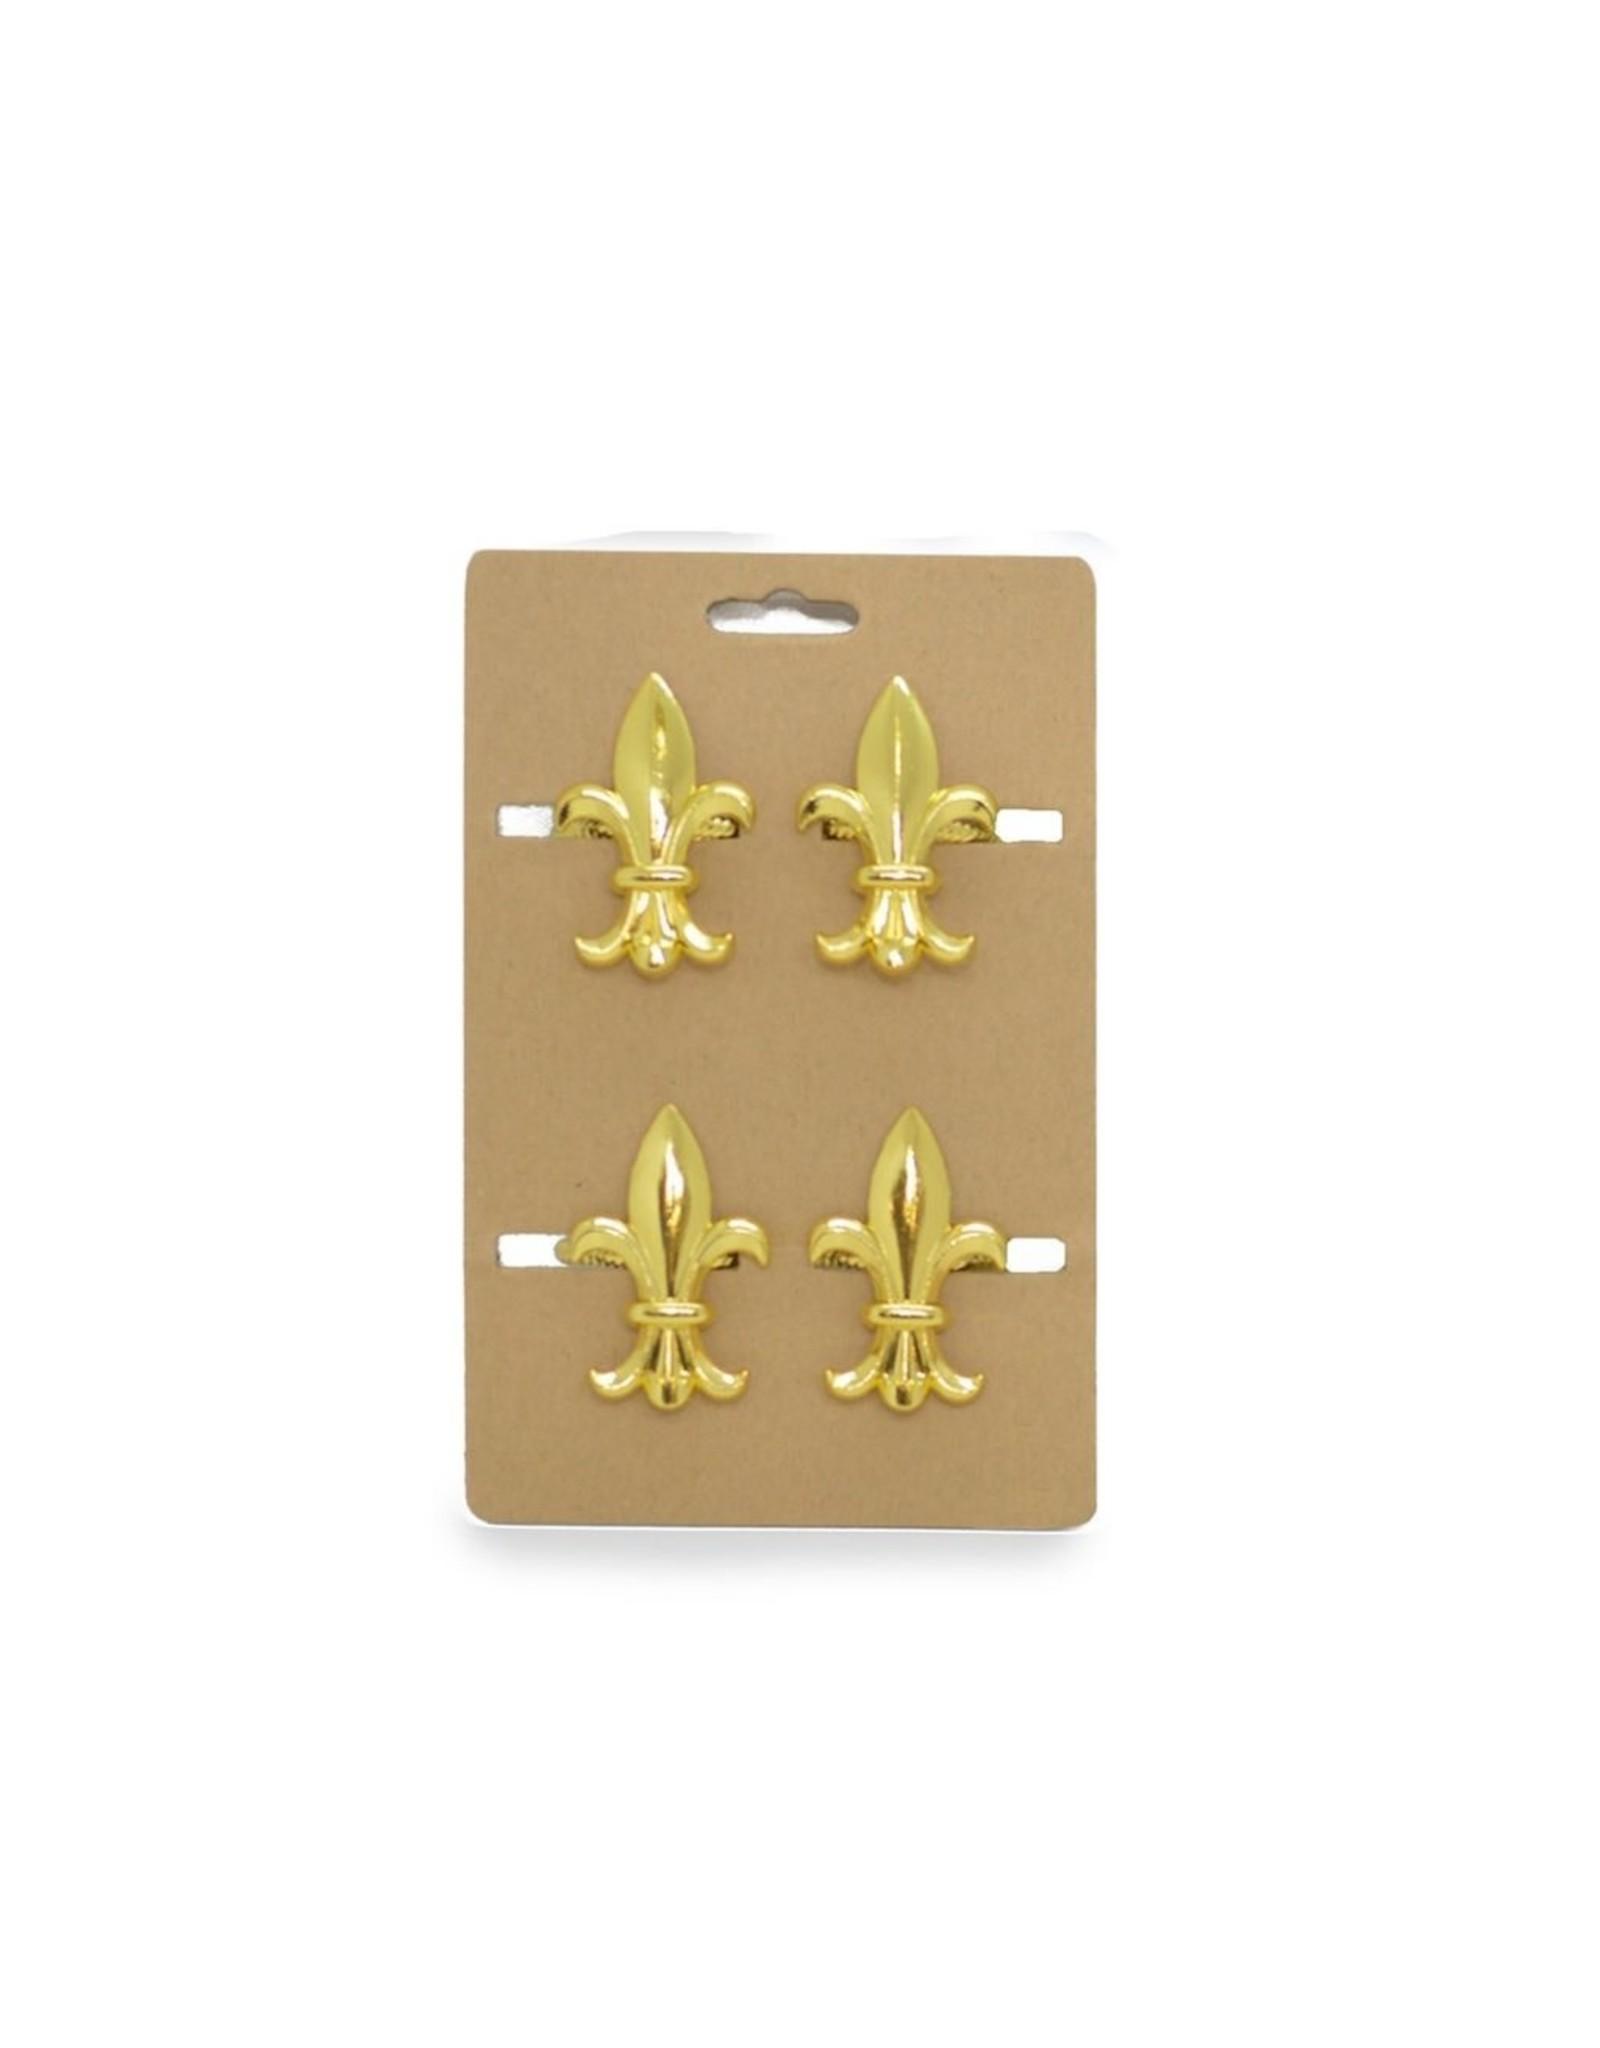 Roux Brand Gold FDL Napkin Rings Set/4